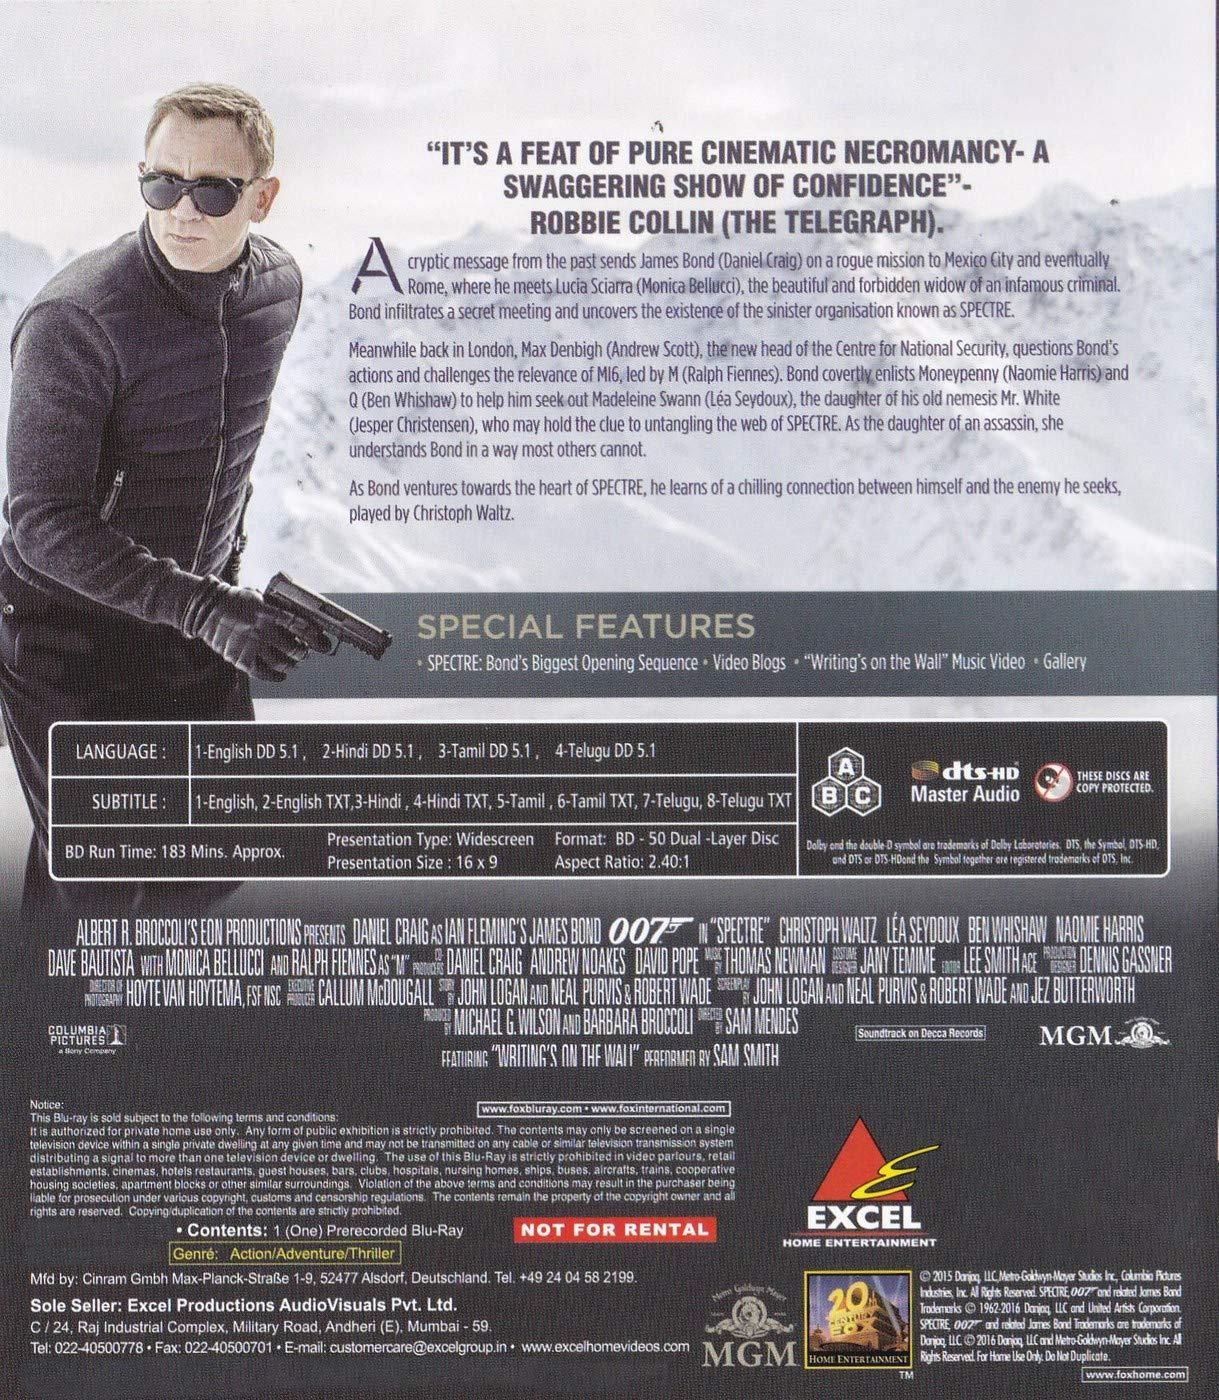 Amazon in: Buy 007: Spectre - Daniel Craig as James Bond DVD, Blu